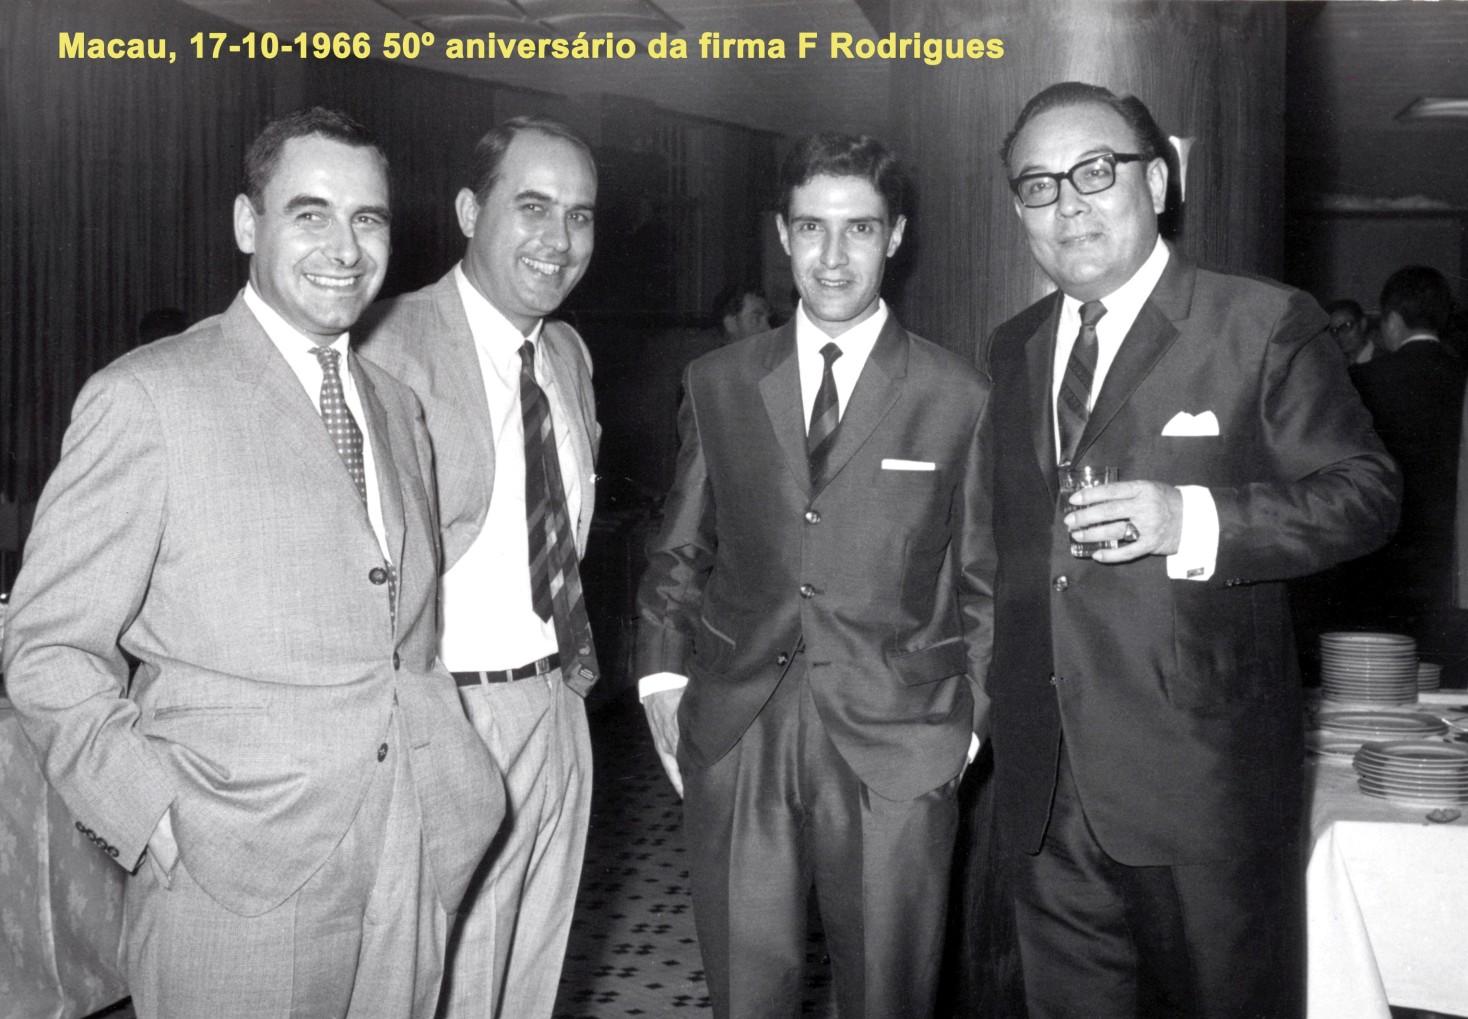 039 66-10-17 50 aniversário de F Rodrigues